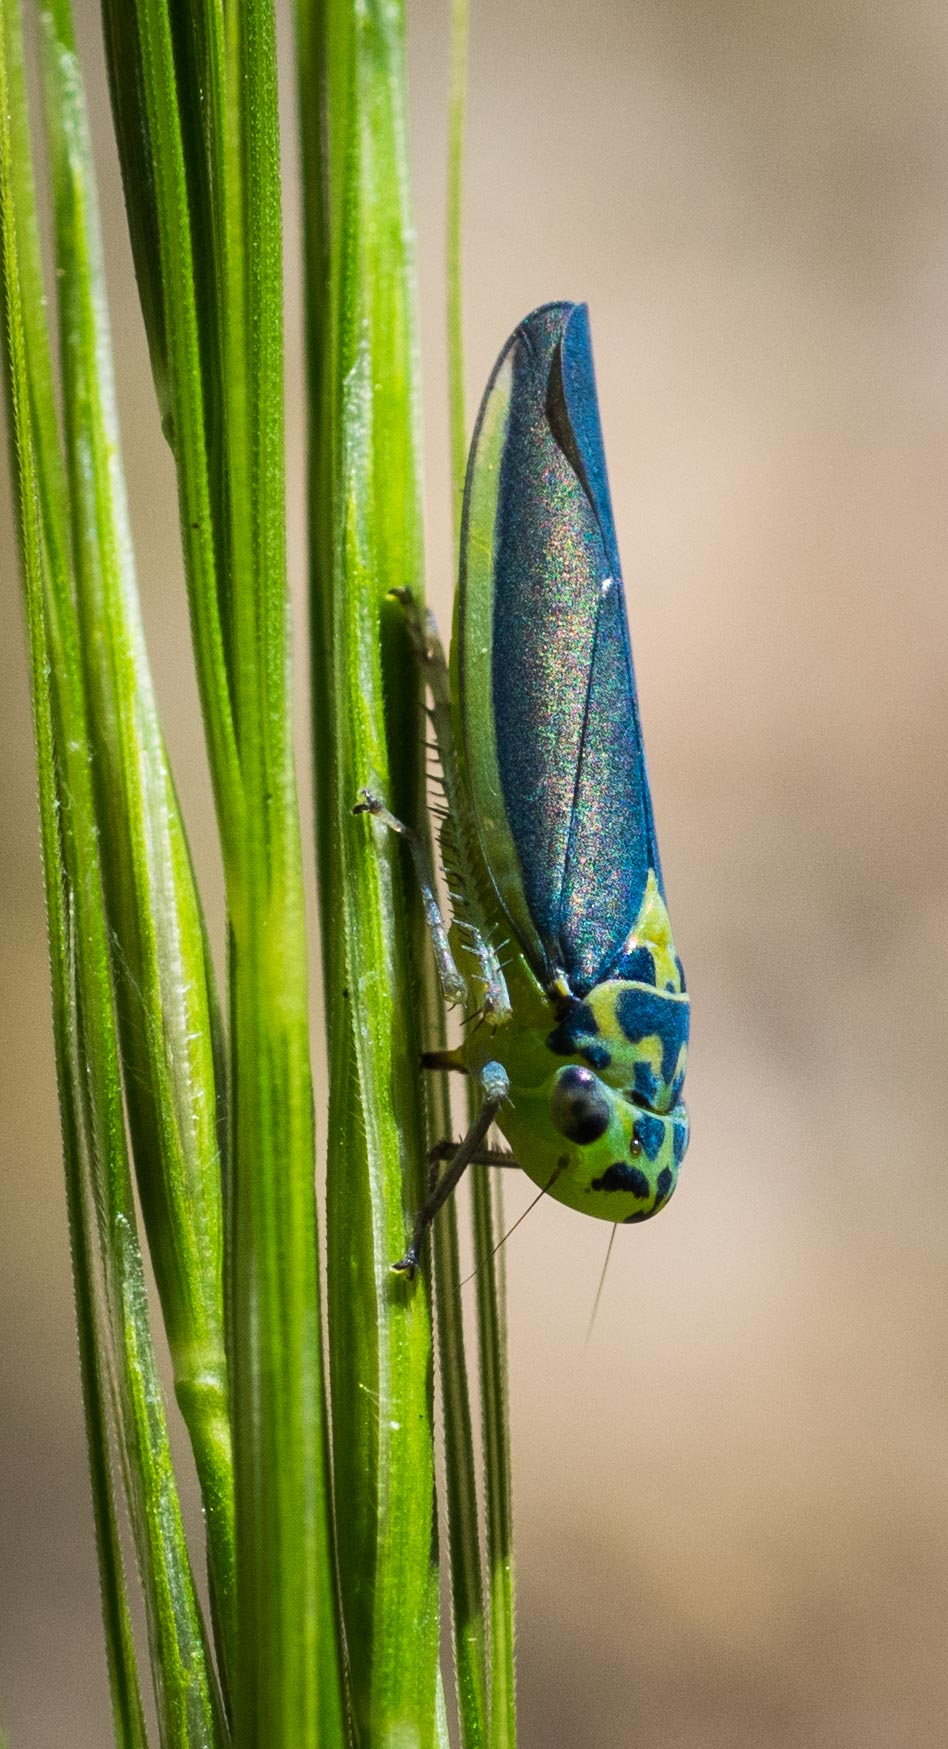 Blue and Green Leafhopper,  Ishidaella sp.   Order: Hemiptera; Family: Cicadellidae